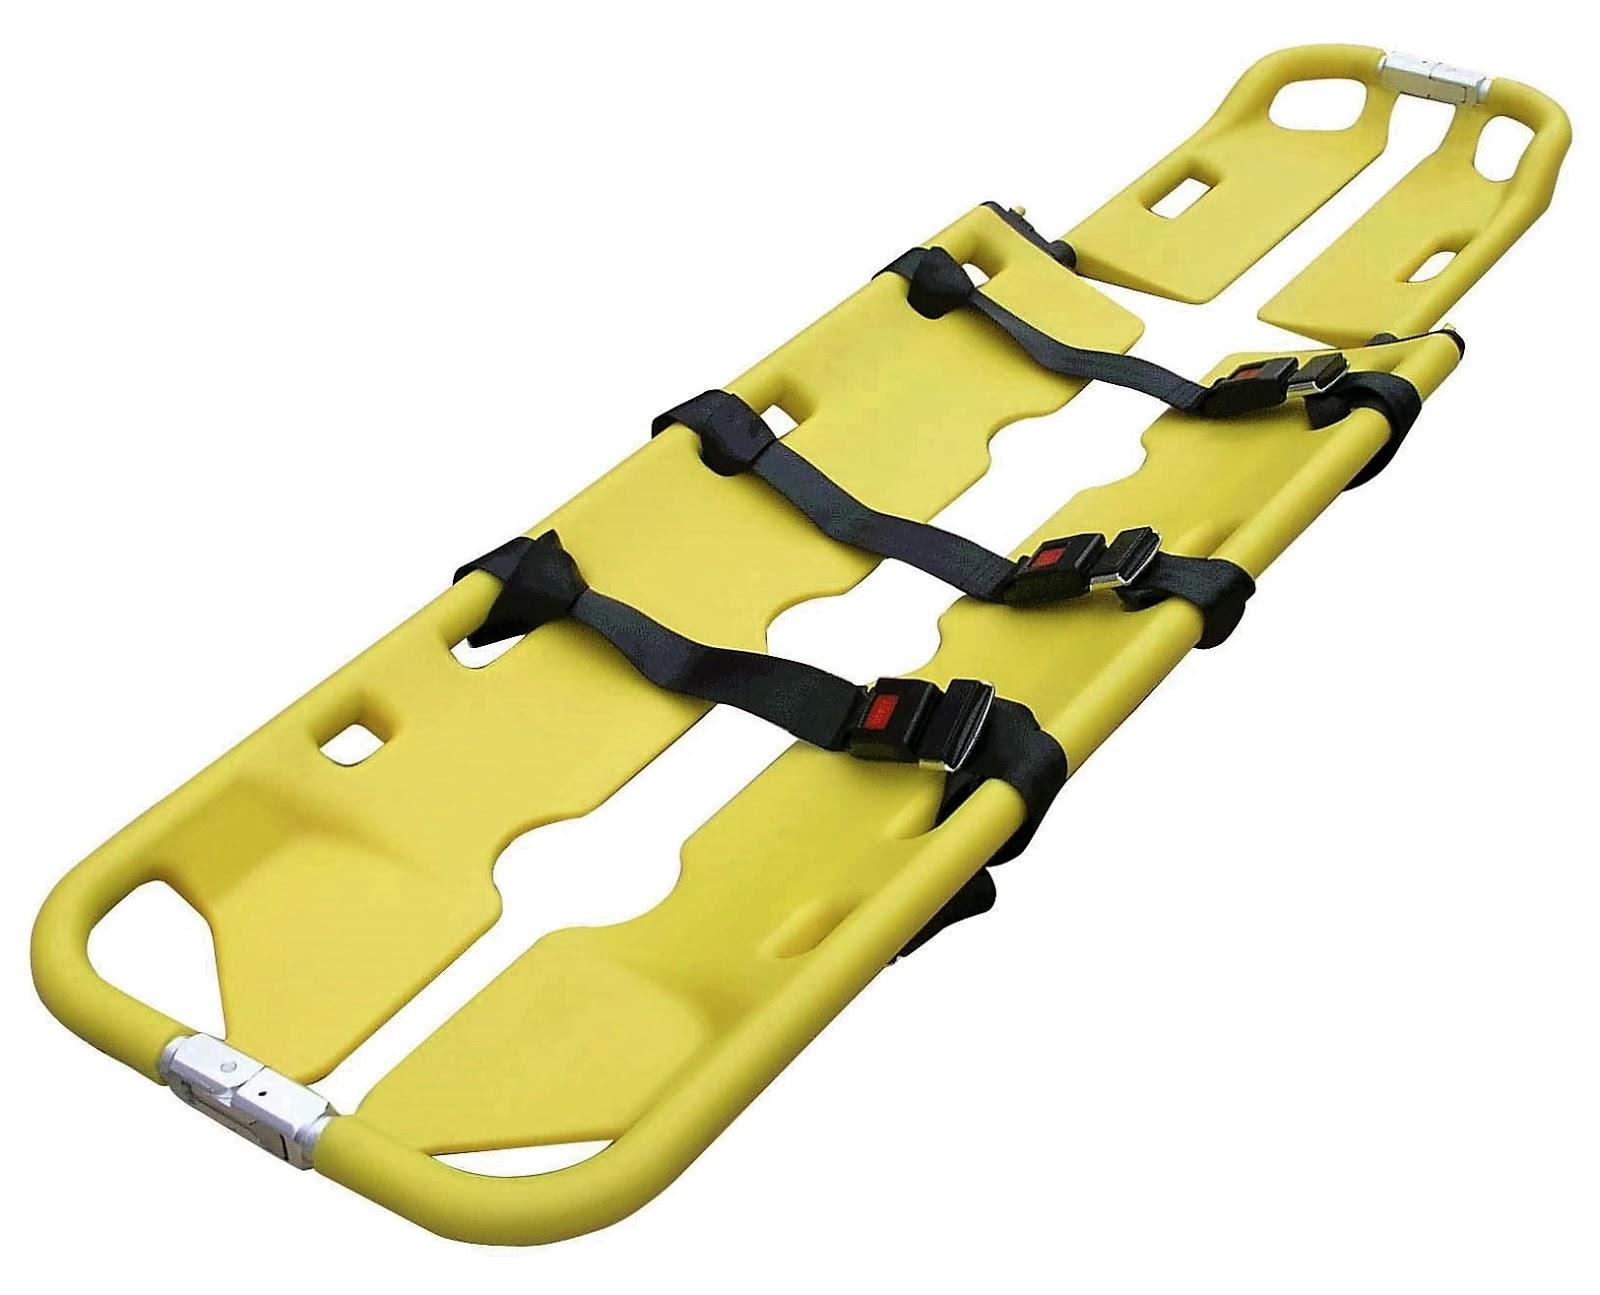 ems solutions international marca registrada scoop stretcher vs the